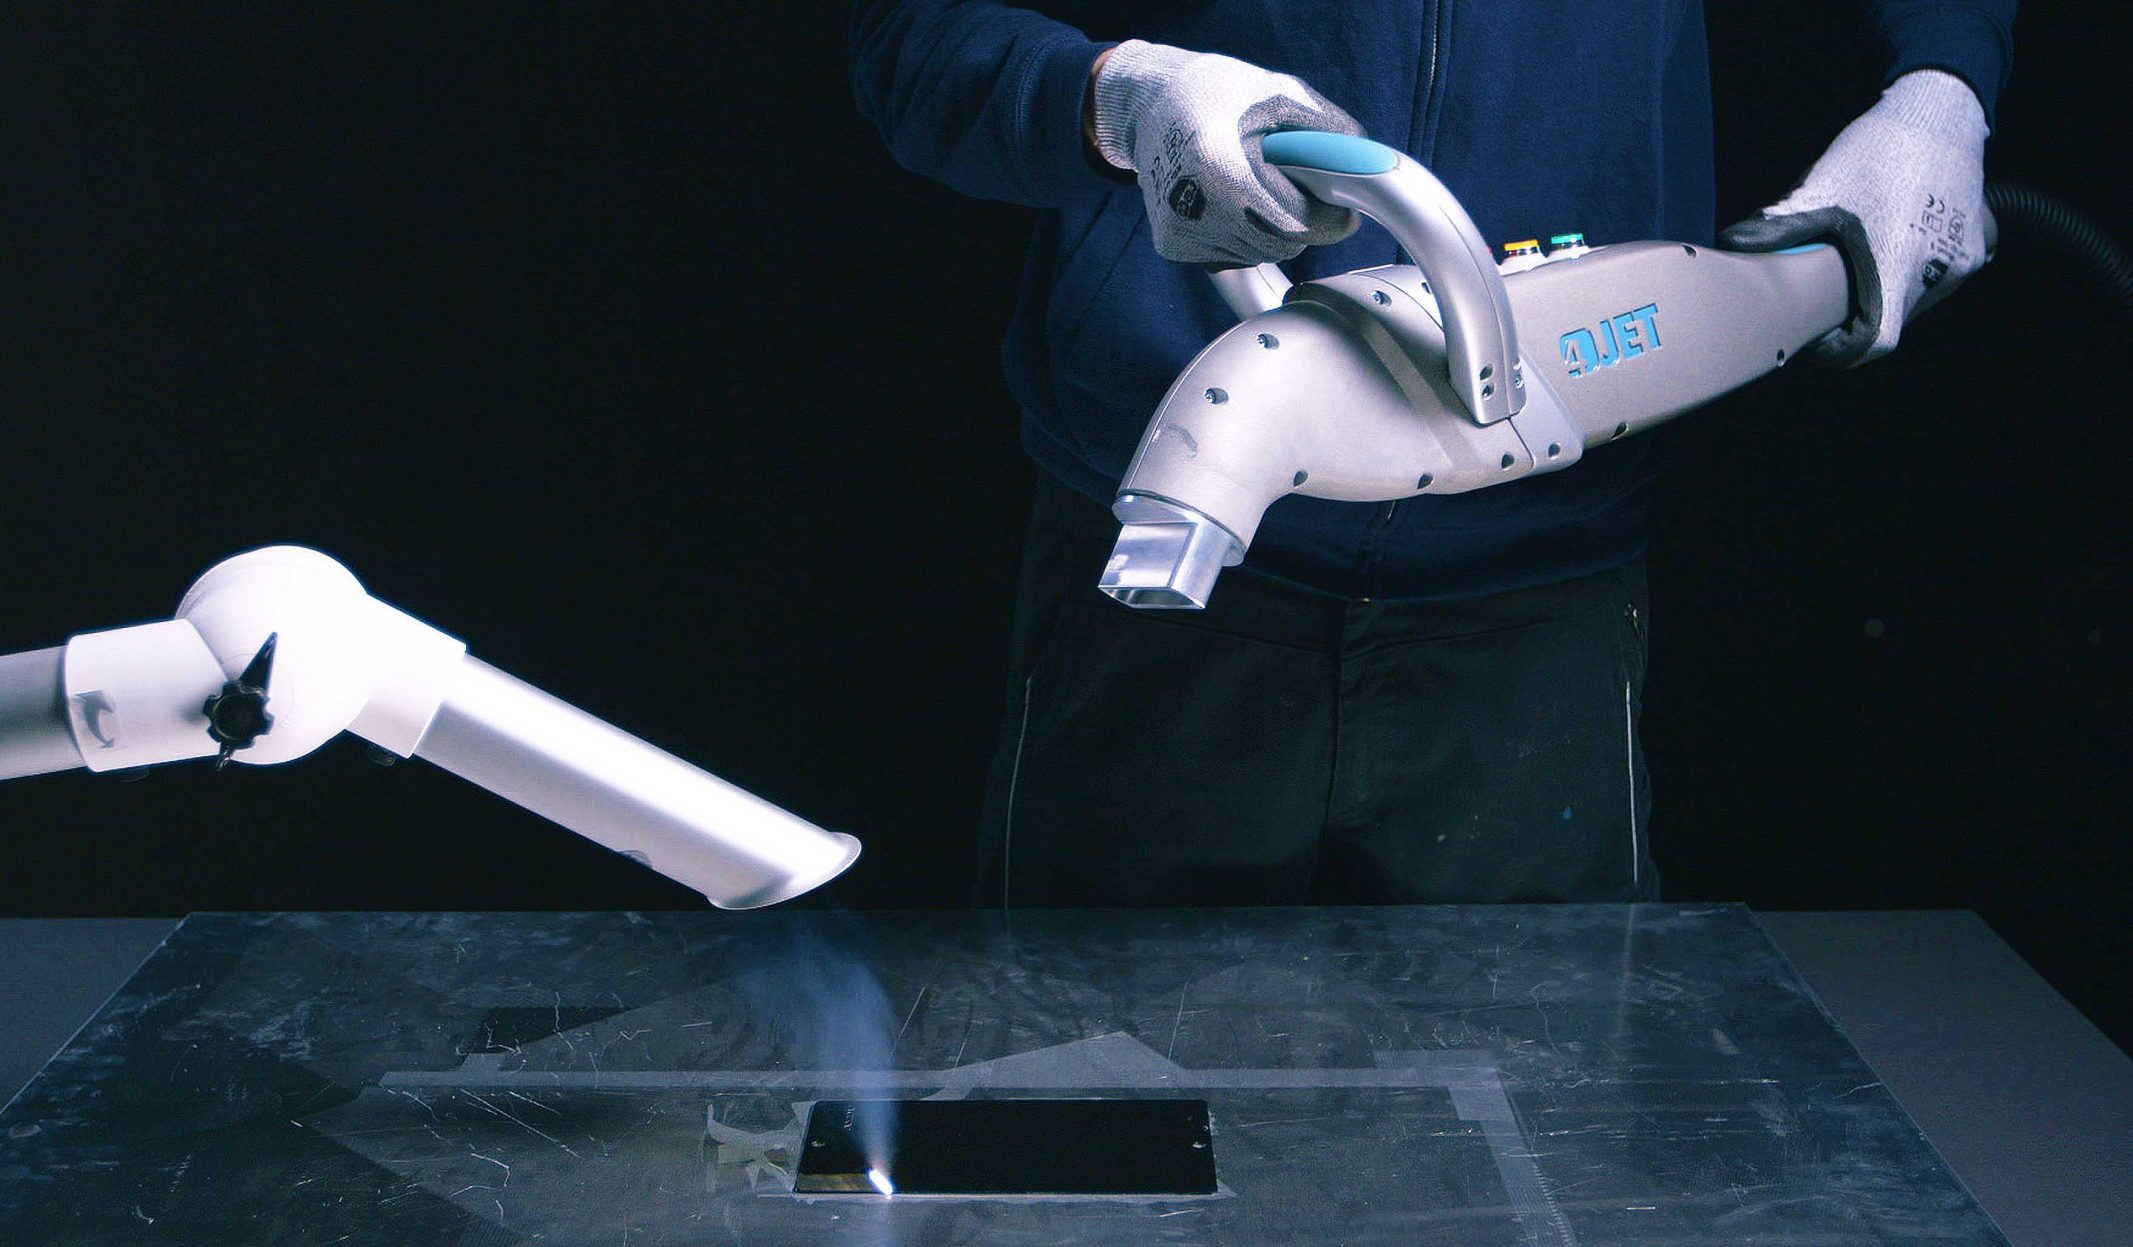 Products4Ships 4JET Jetlaser laserclaening